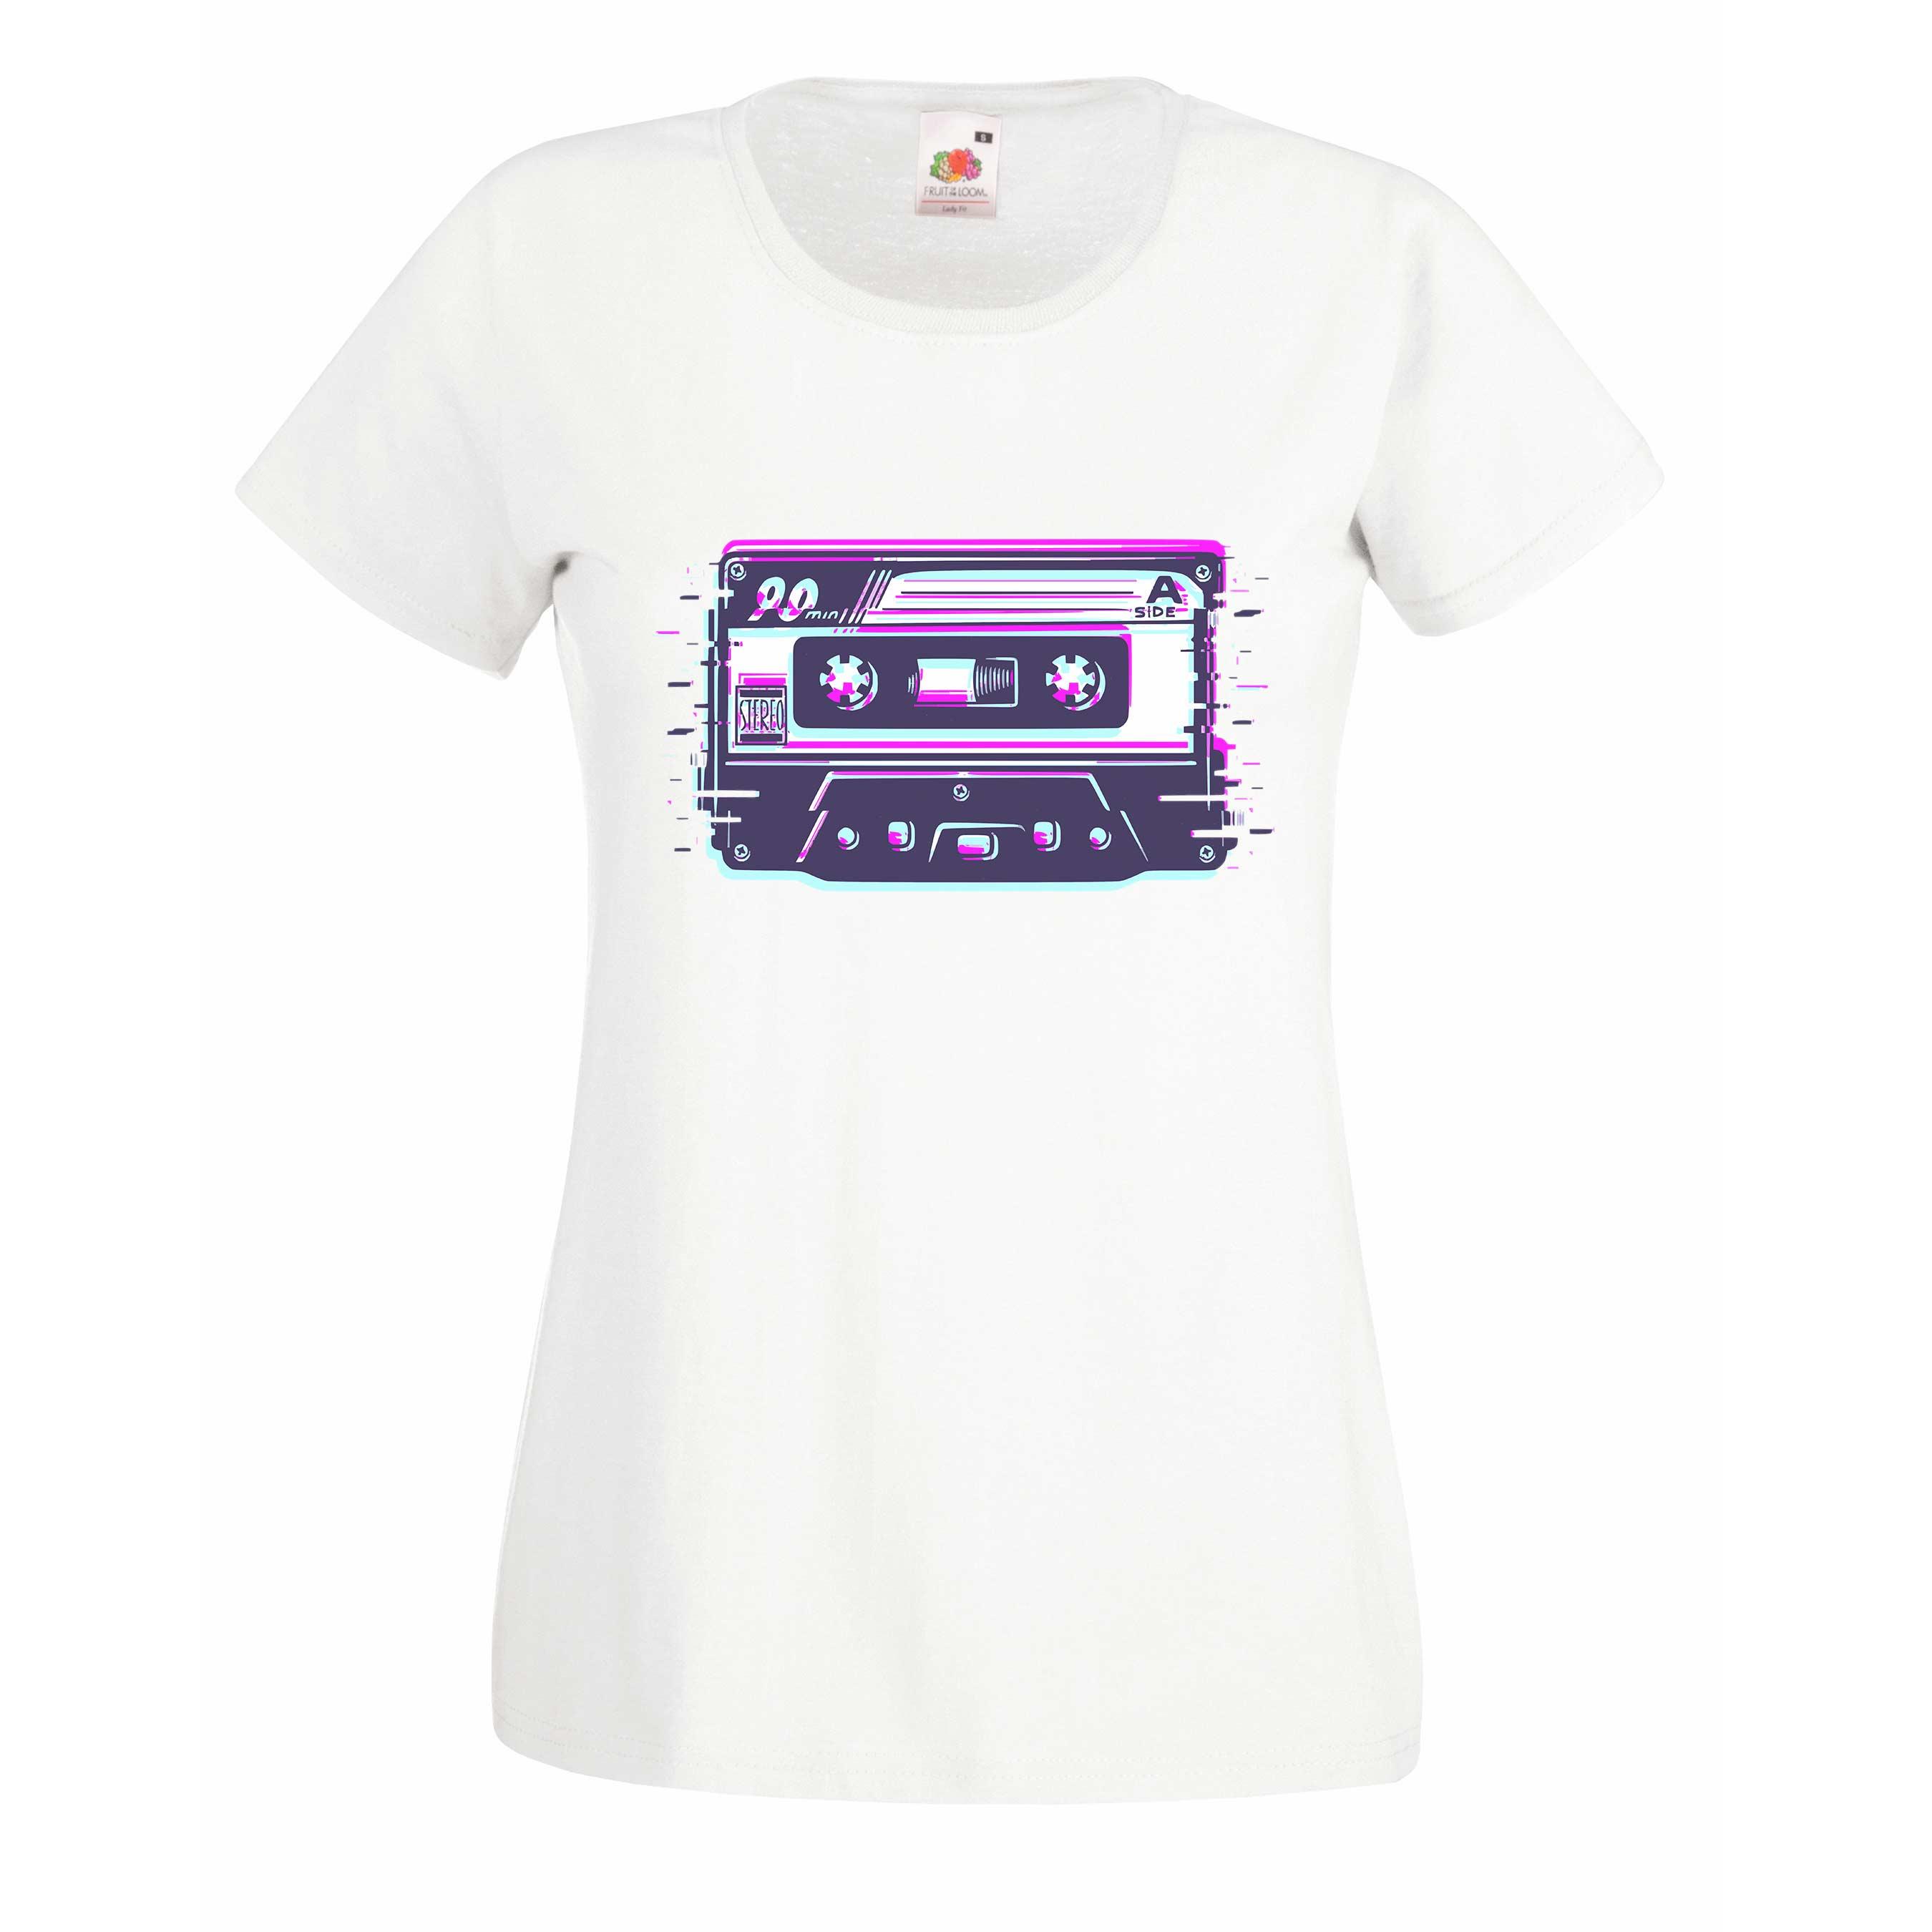 Retro cassette design for t-shirt, hoodie & sweatshirt